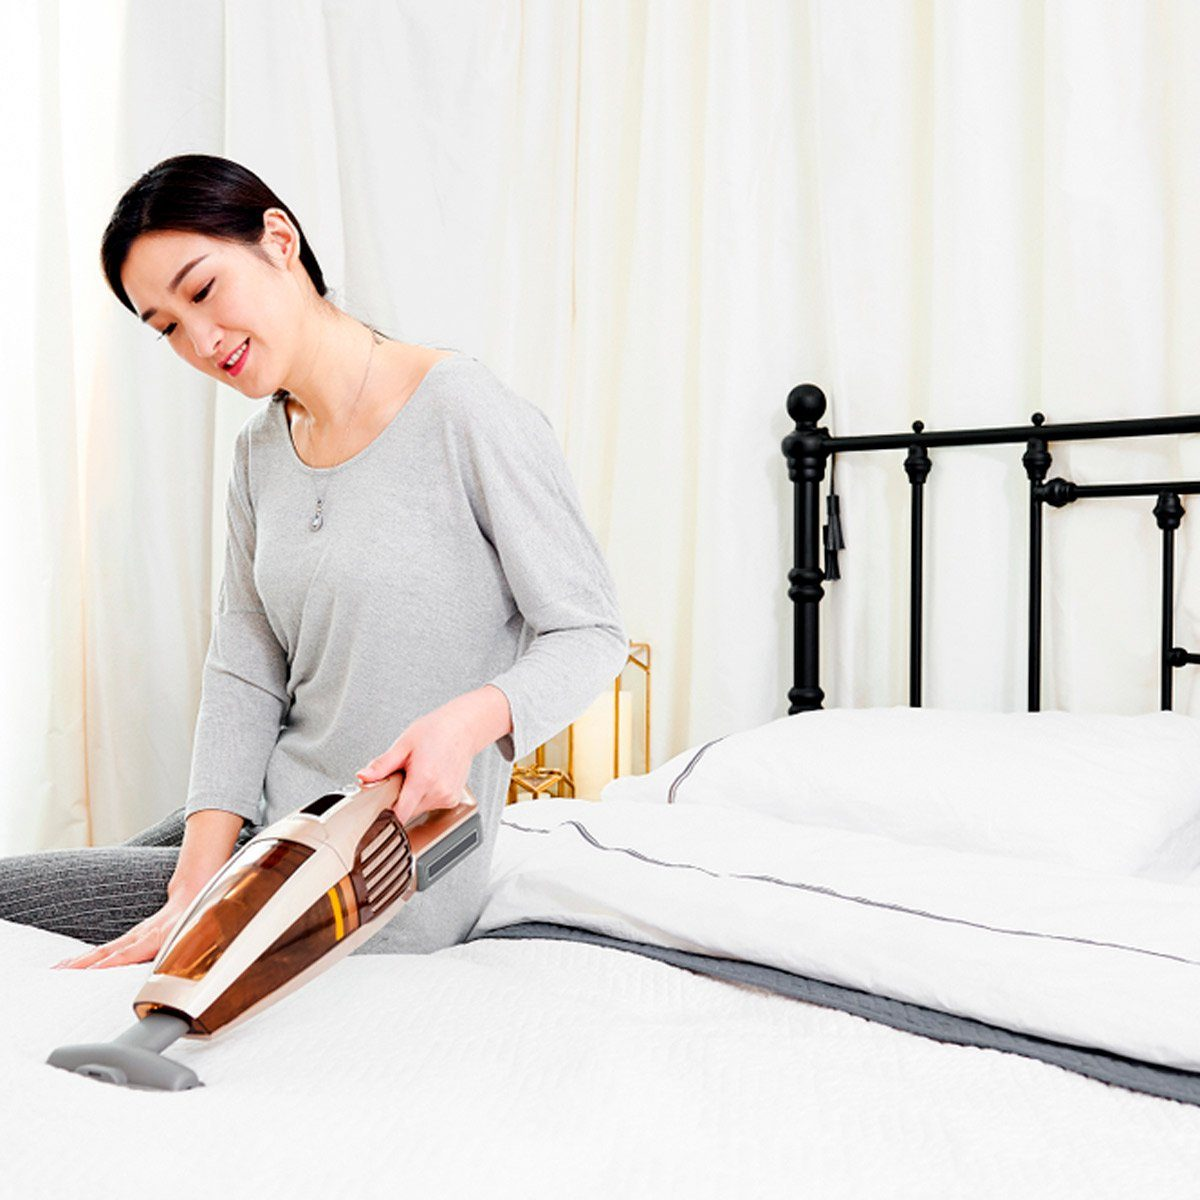 Vacuuming comforter